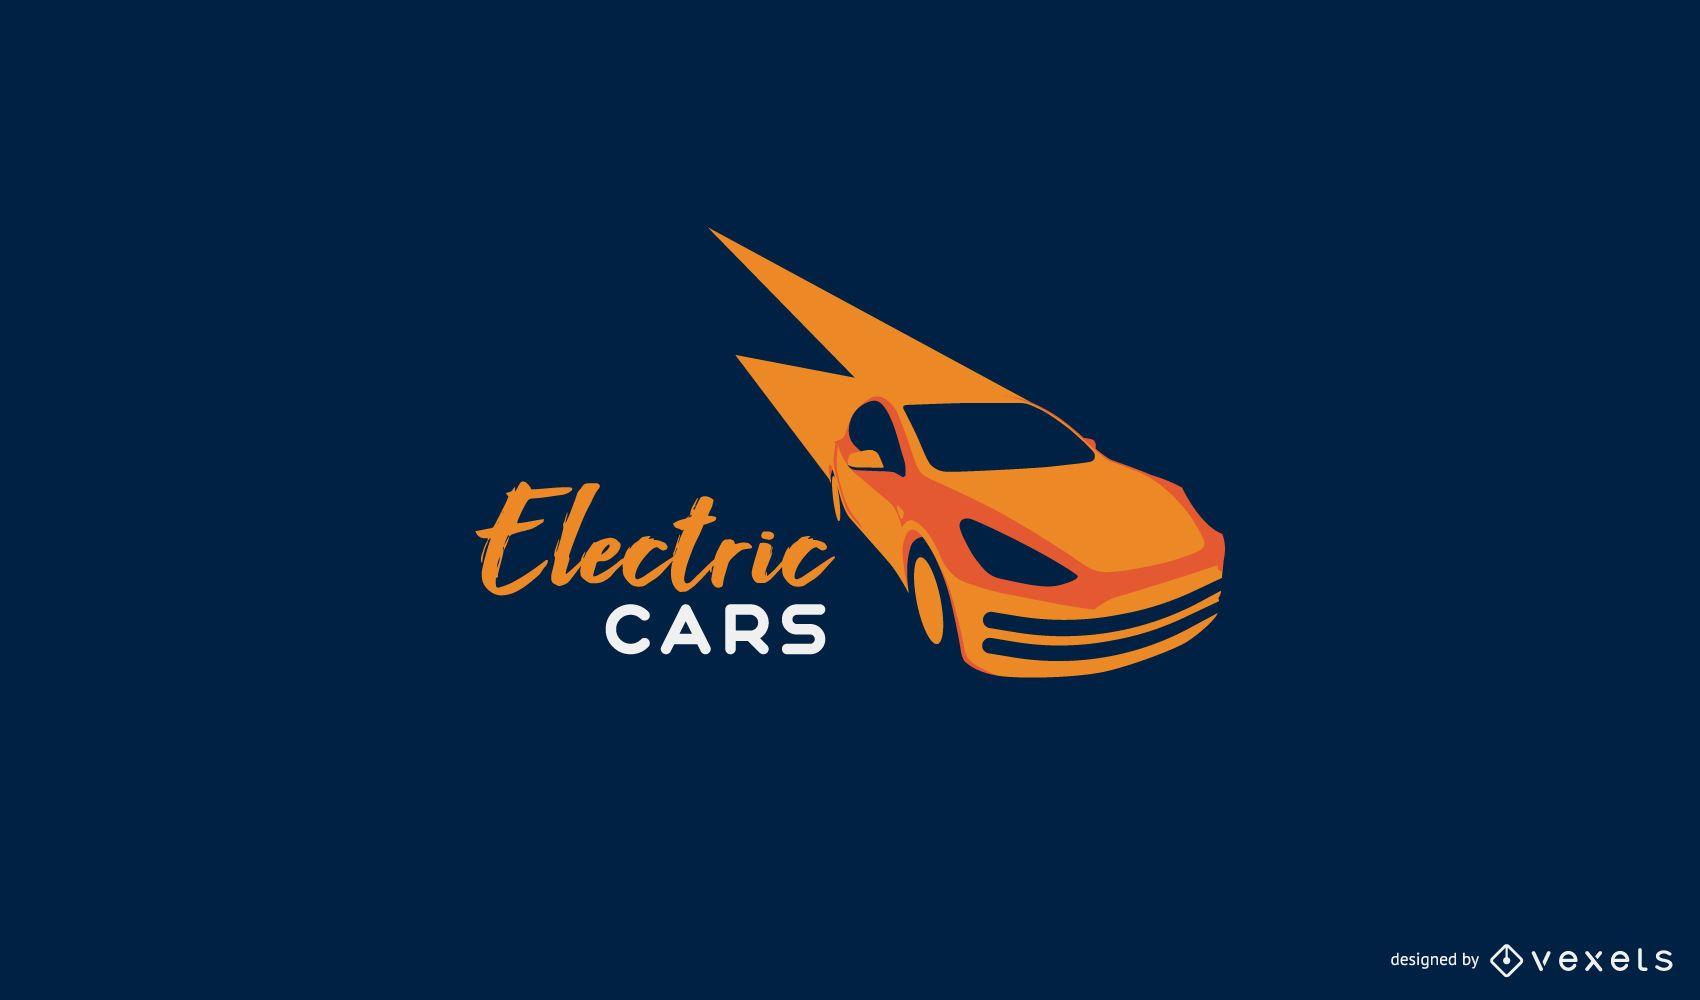 Modelo de logotipo de carro elétrico